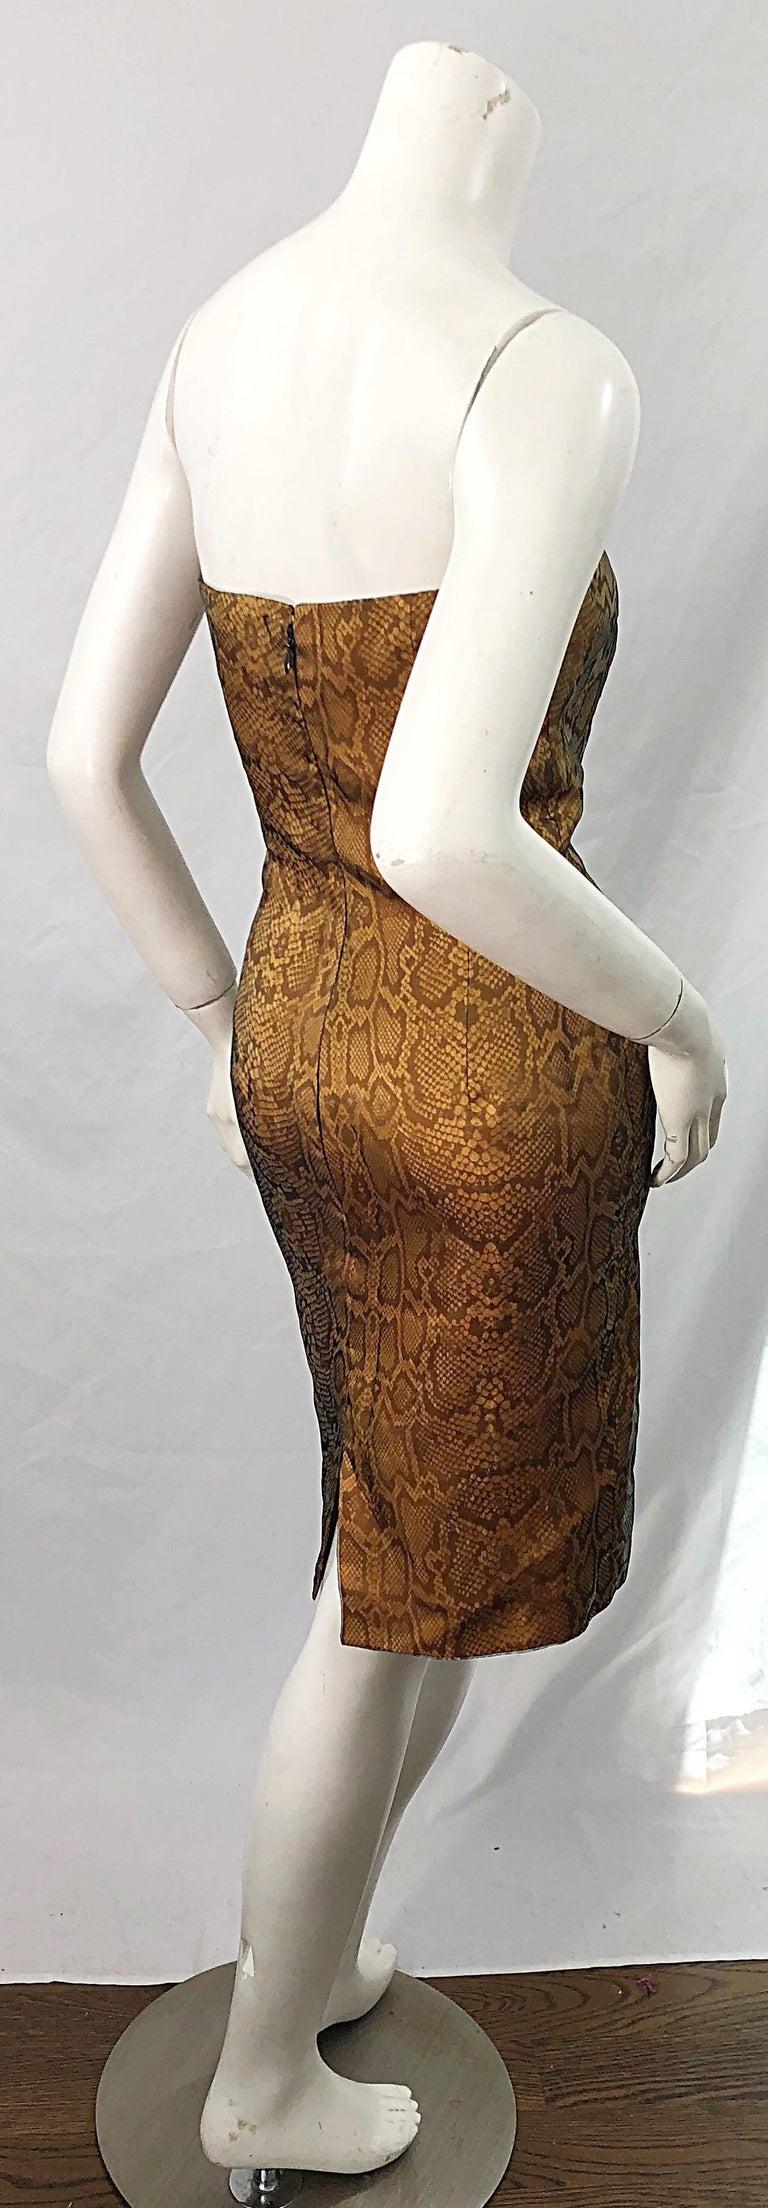 1990s Luca Luca Size 42 / 6 Snakeskin Silk Organza Strapless 90s Tan Brown Dress For Sale 9